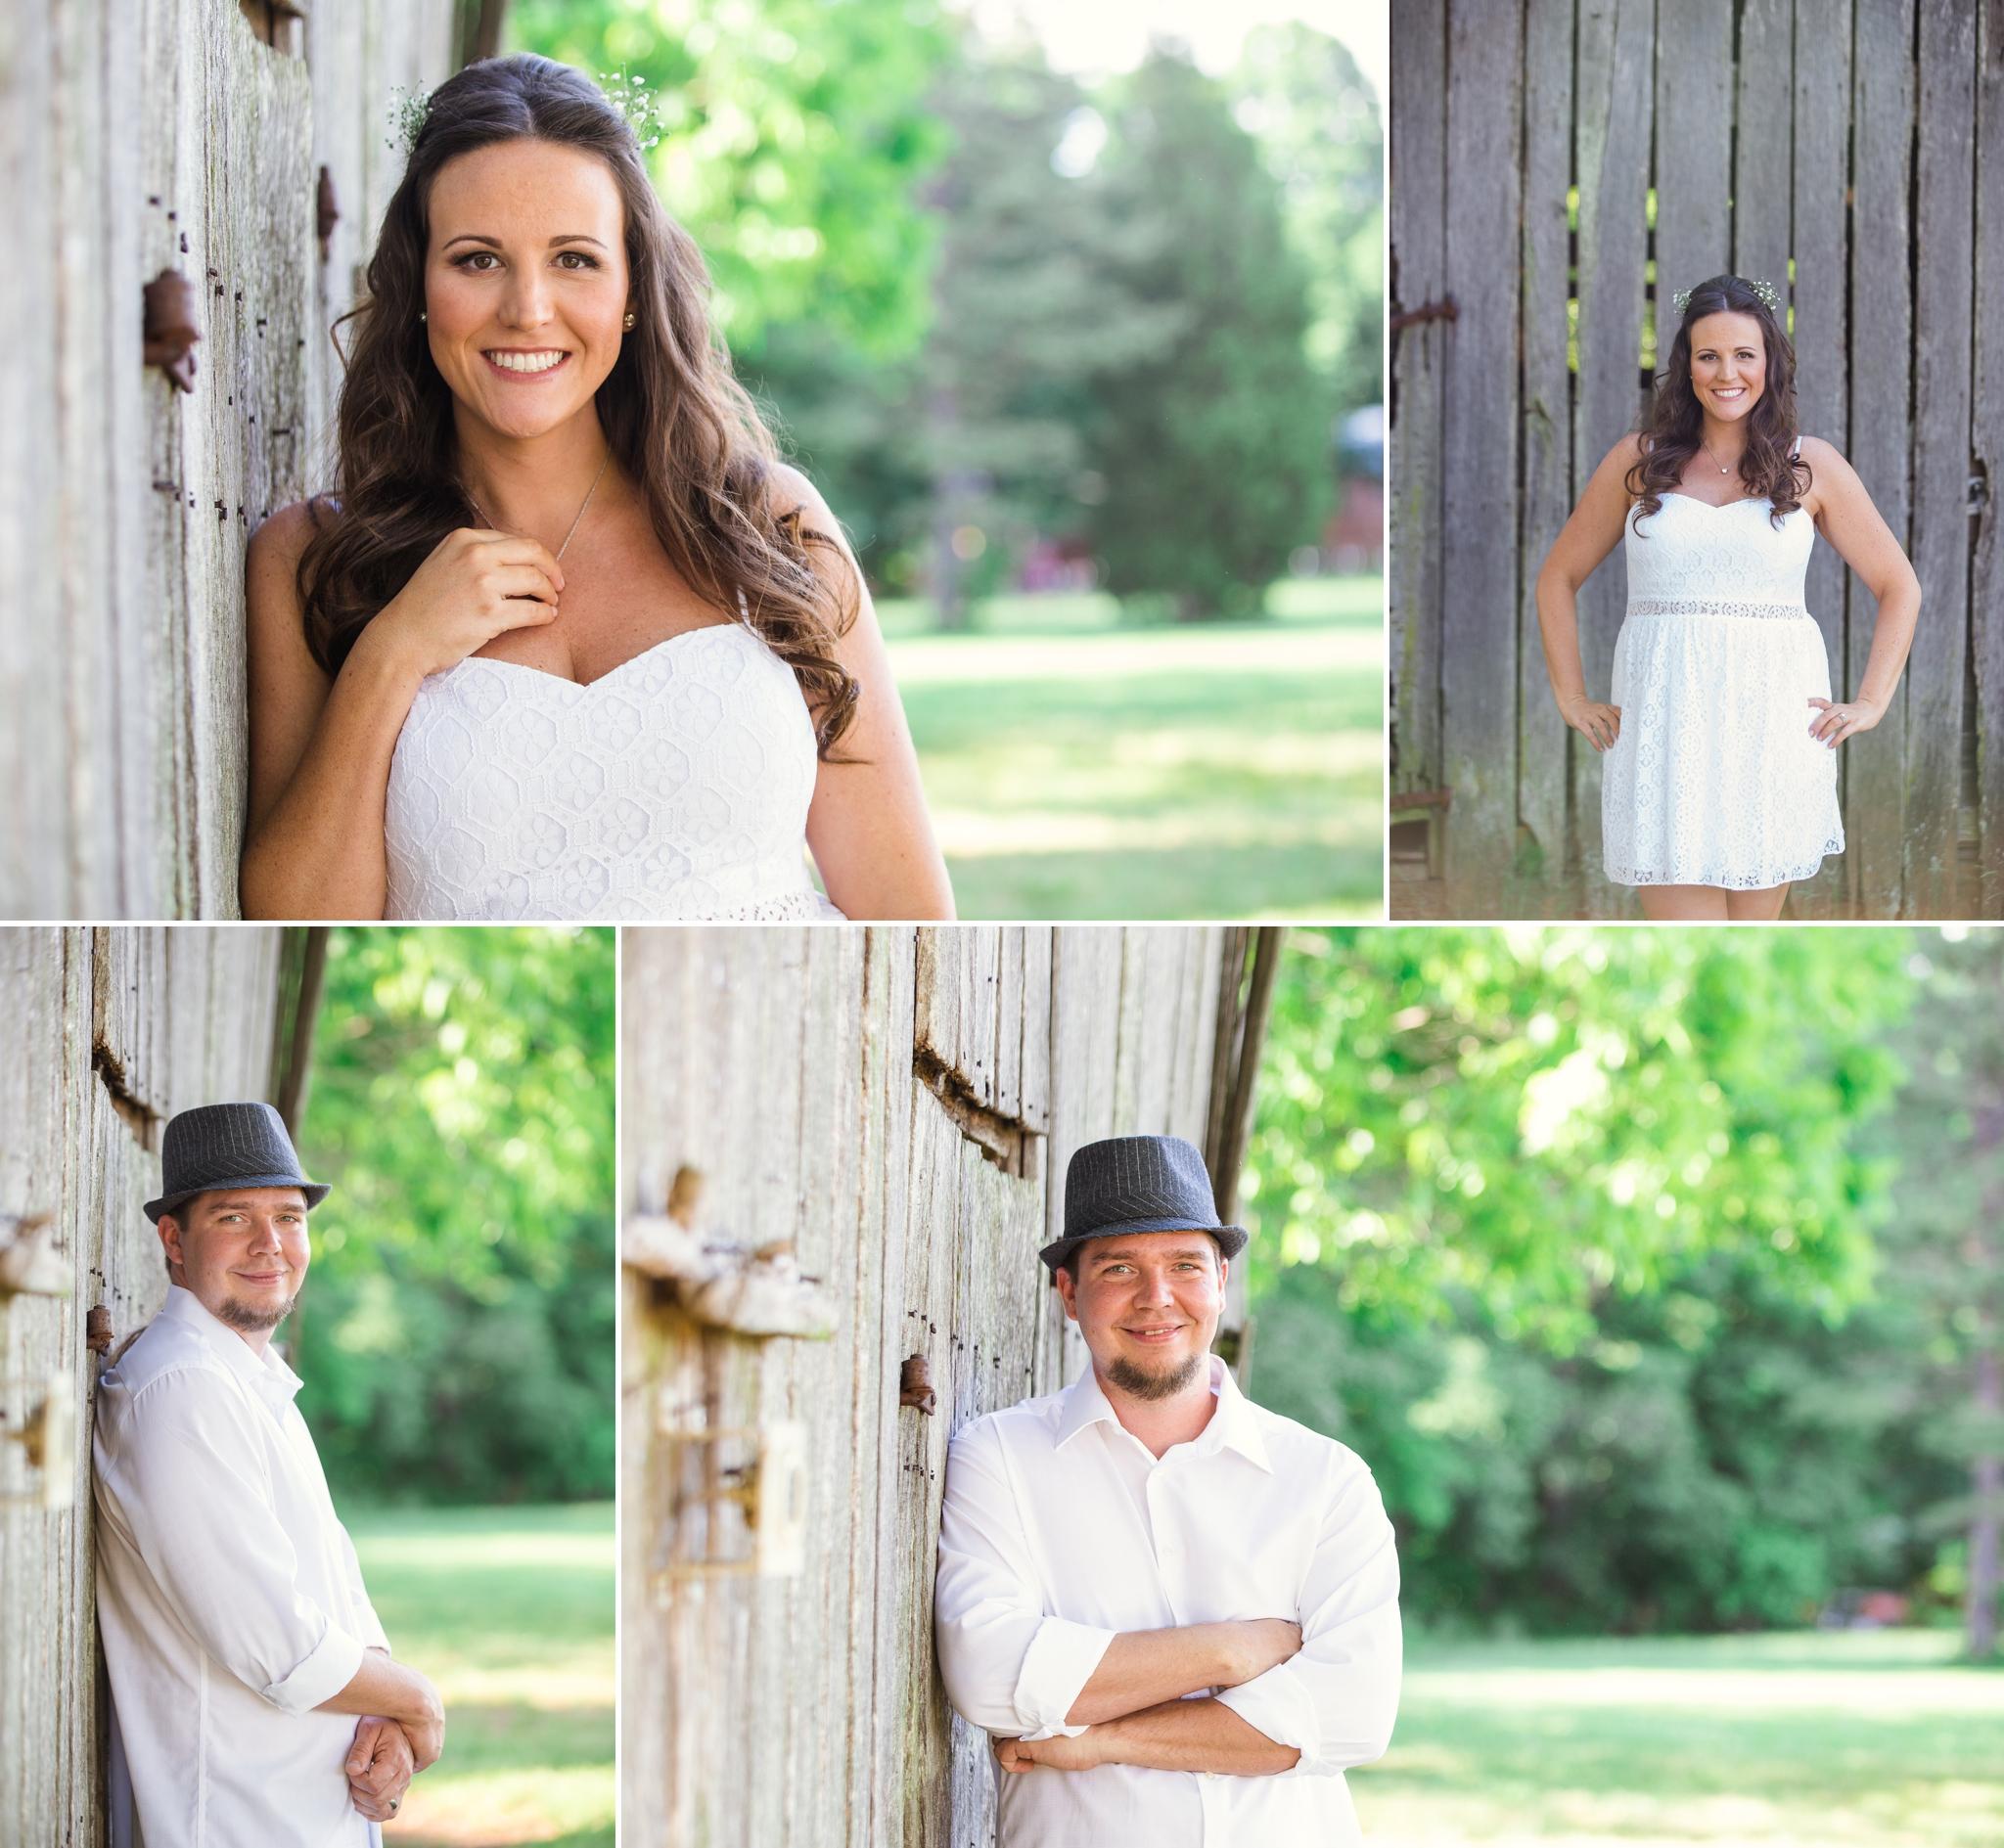 Wedding Photographer in Fayetteville, North Carolina